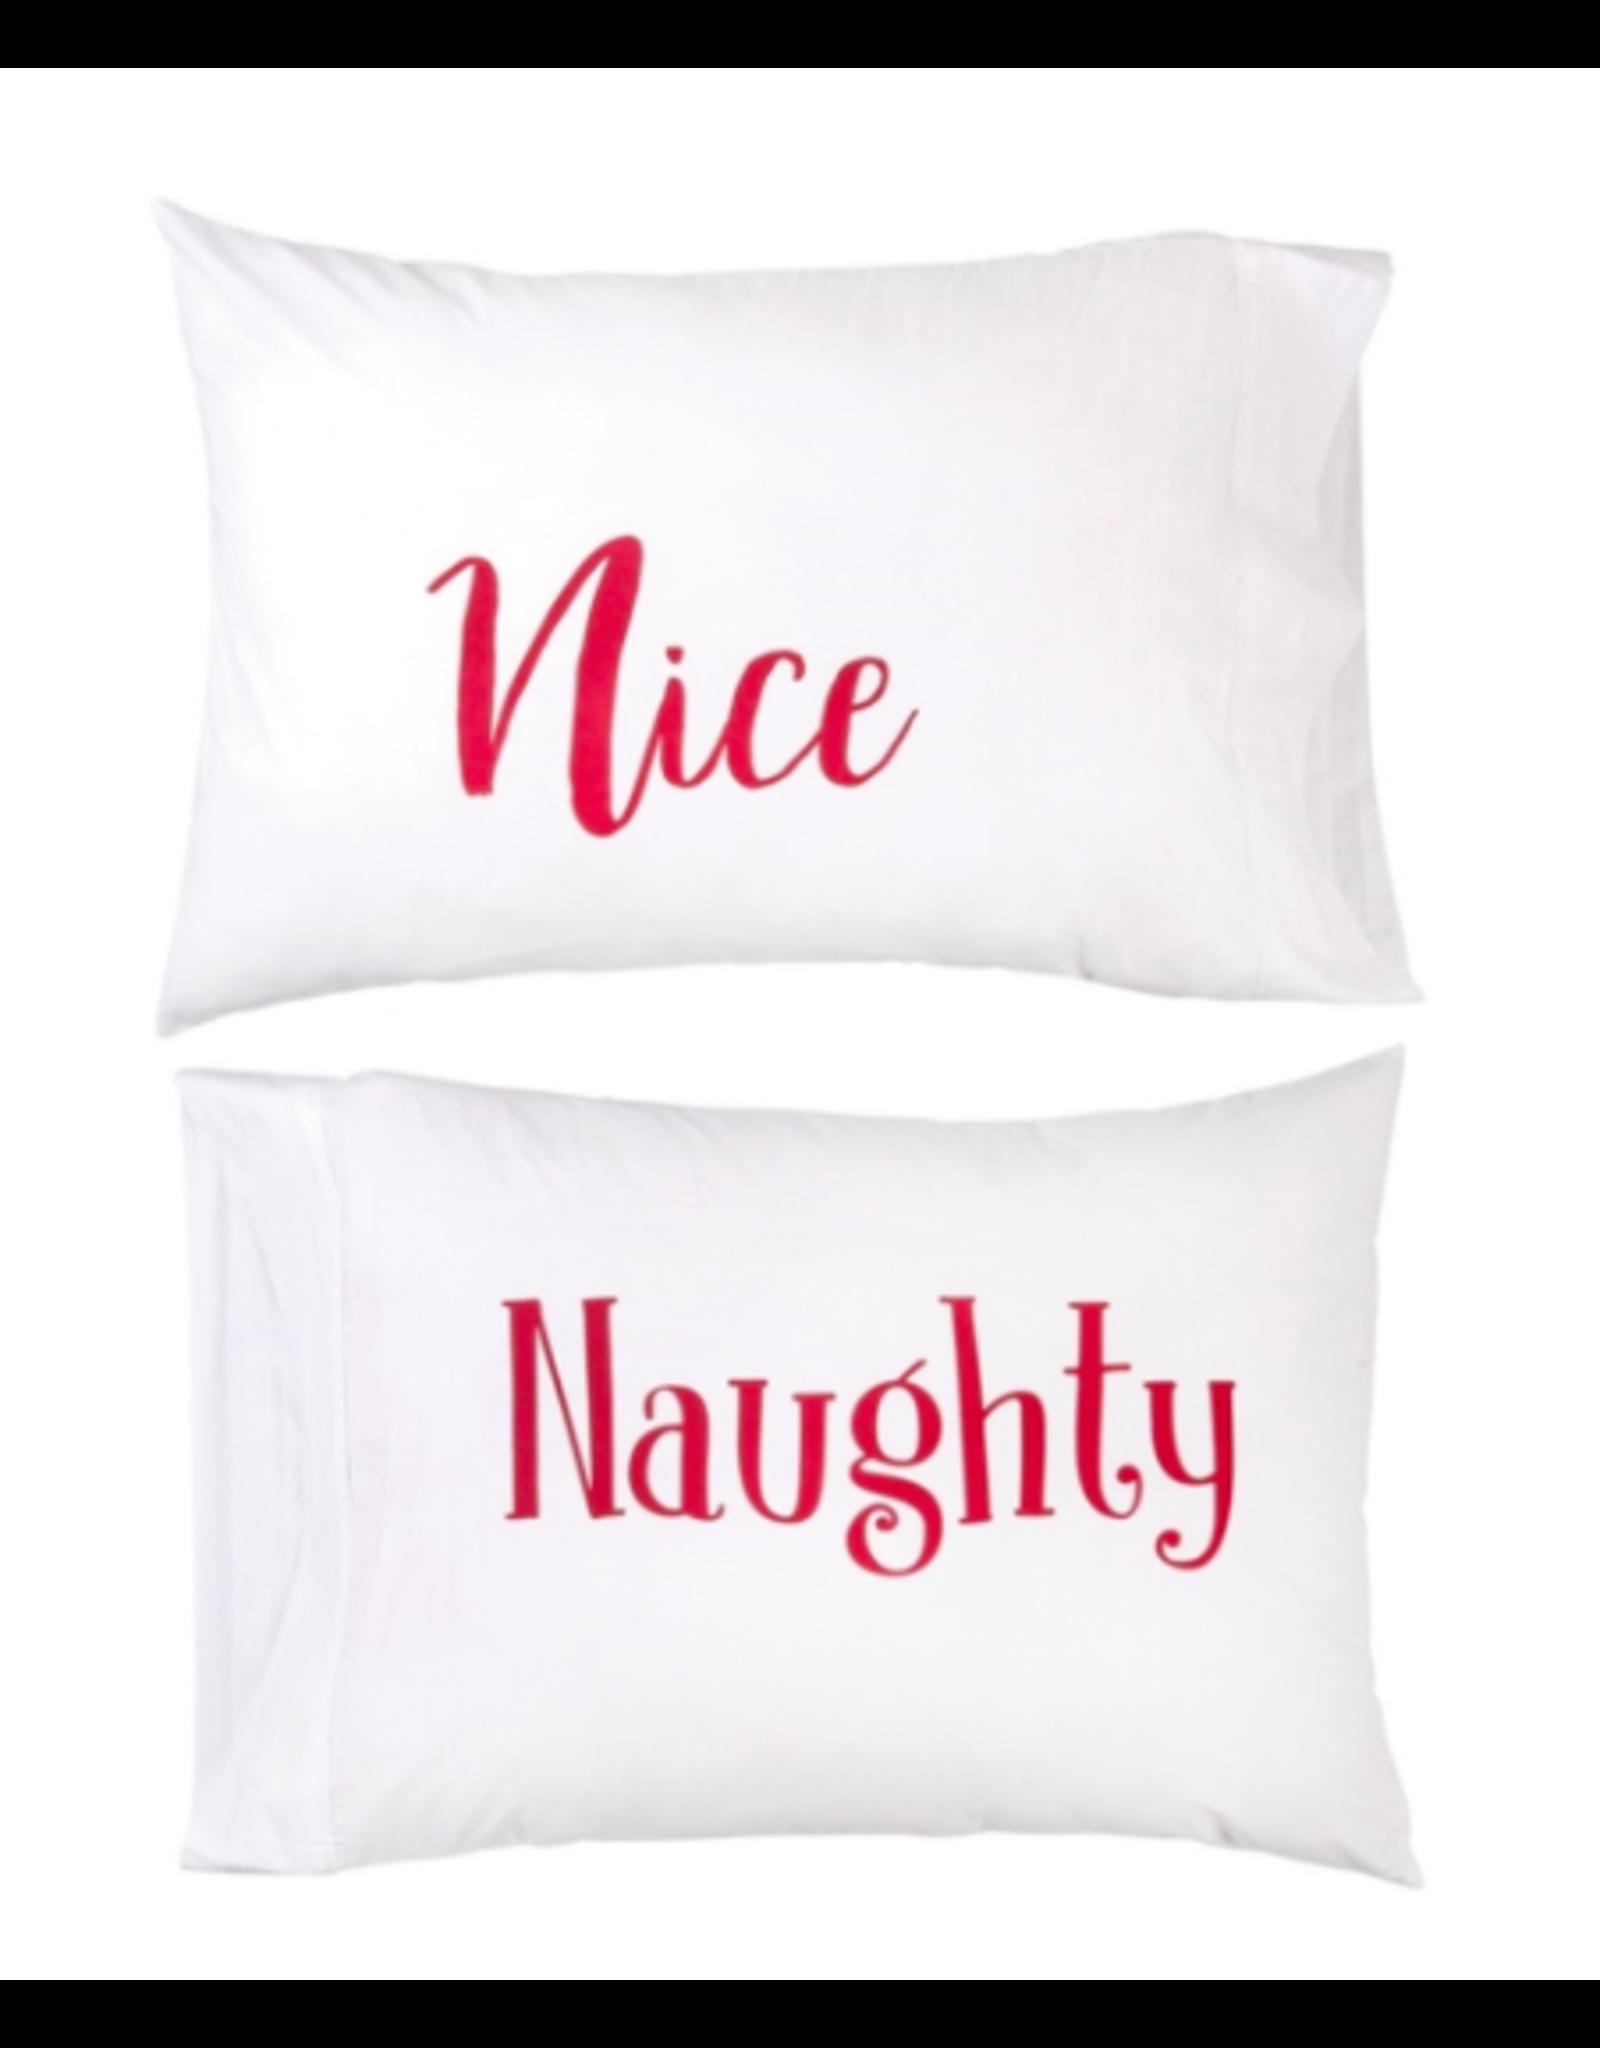 C&F Enterprises Naughty and Nice Pillowcase Set